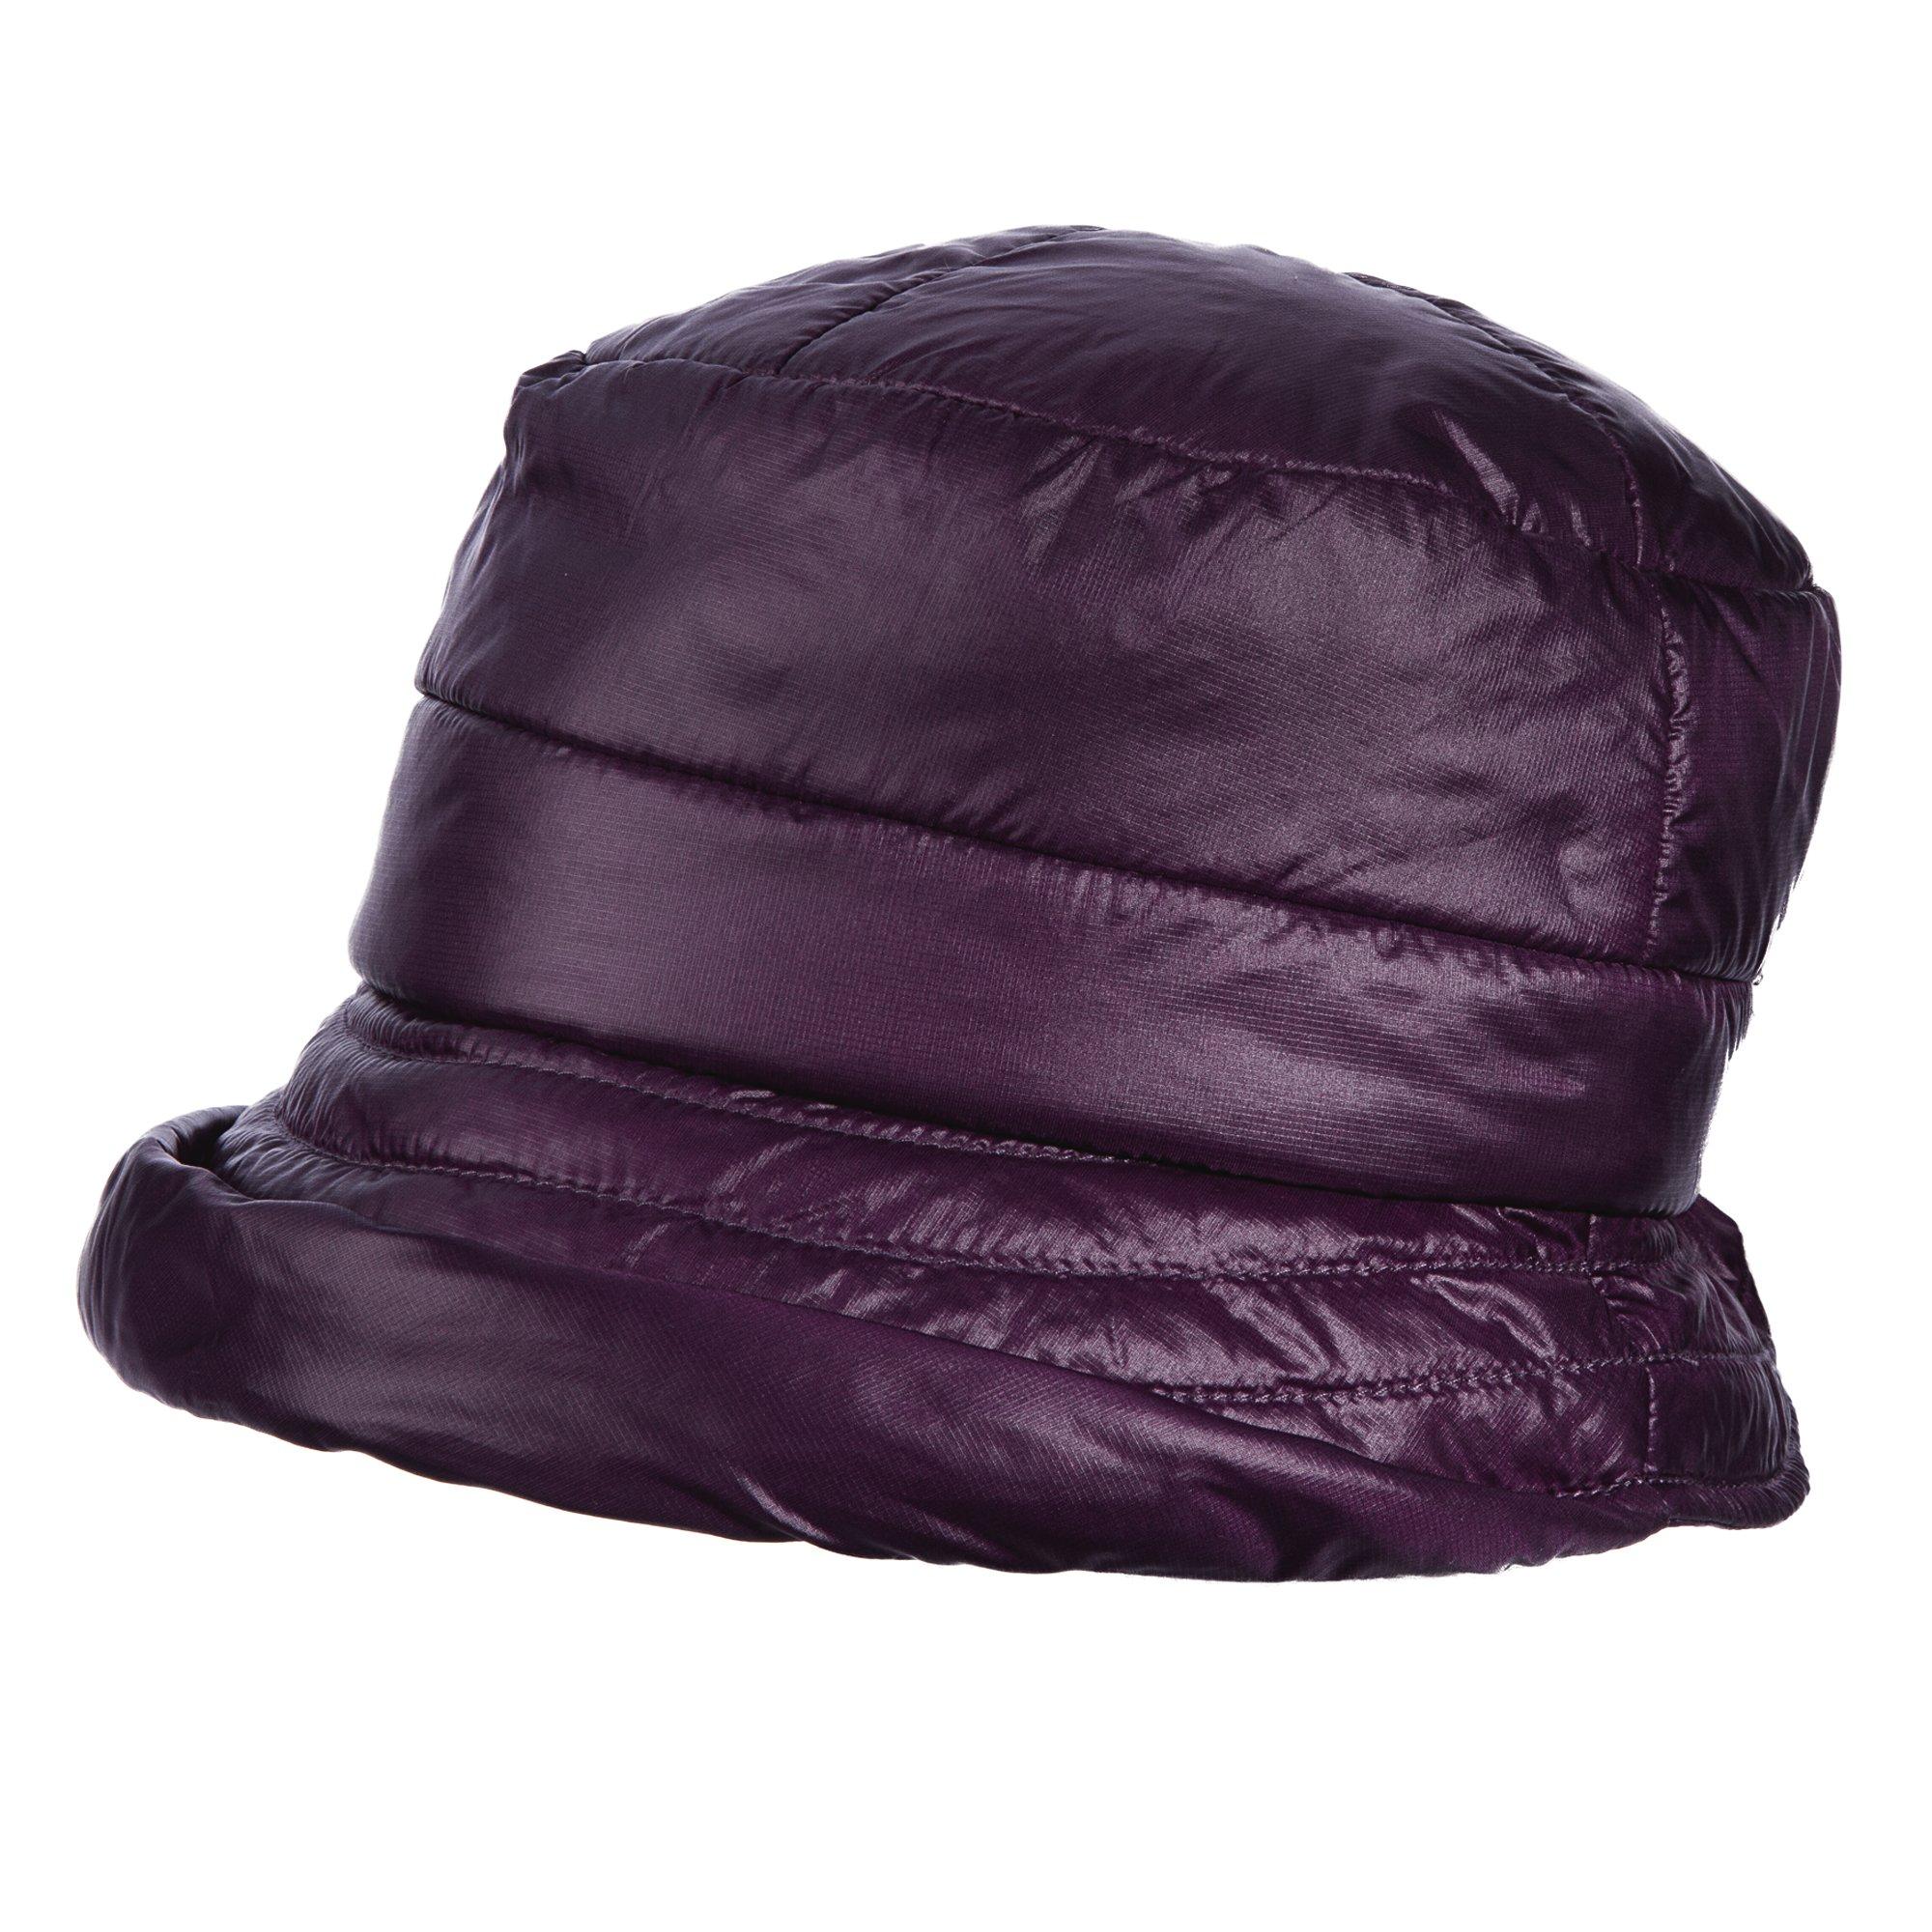 SCALA Womens Puff Cloche Fleece Rain Hat (Purple)